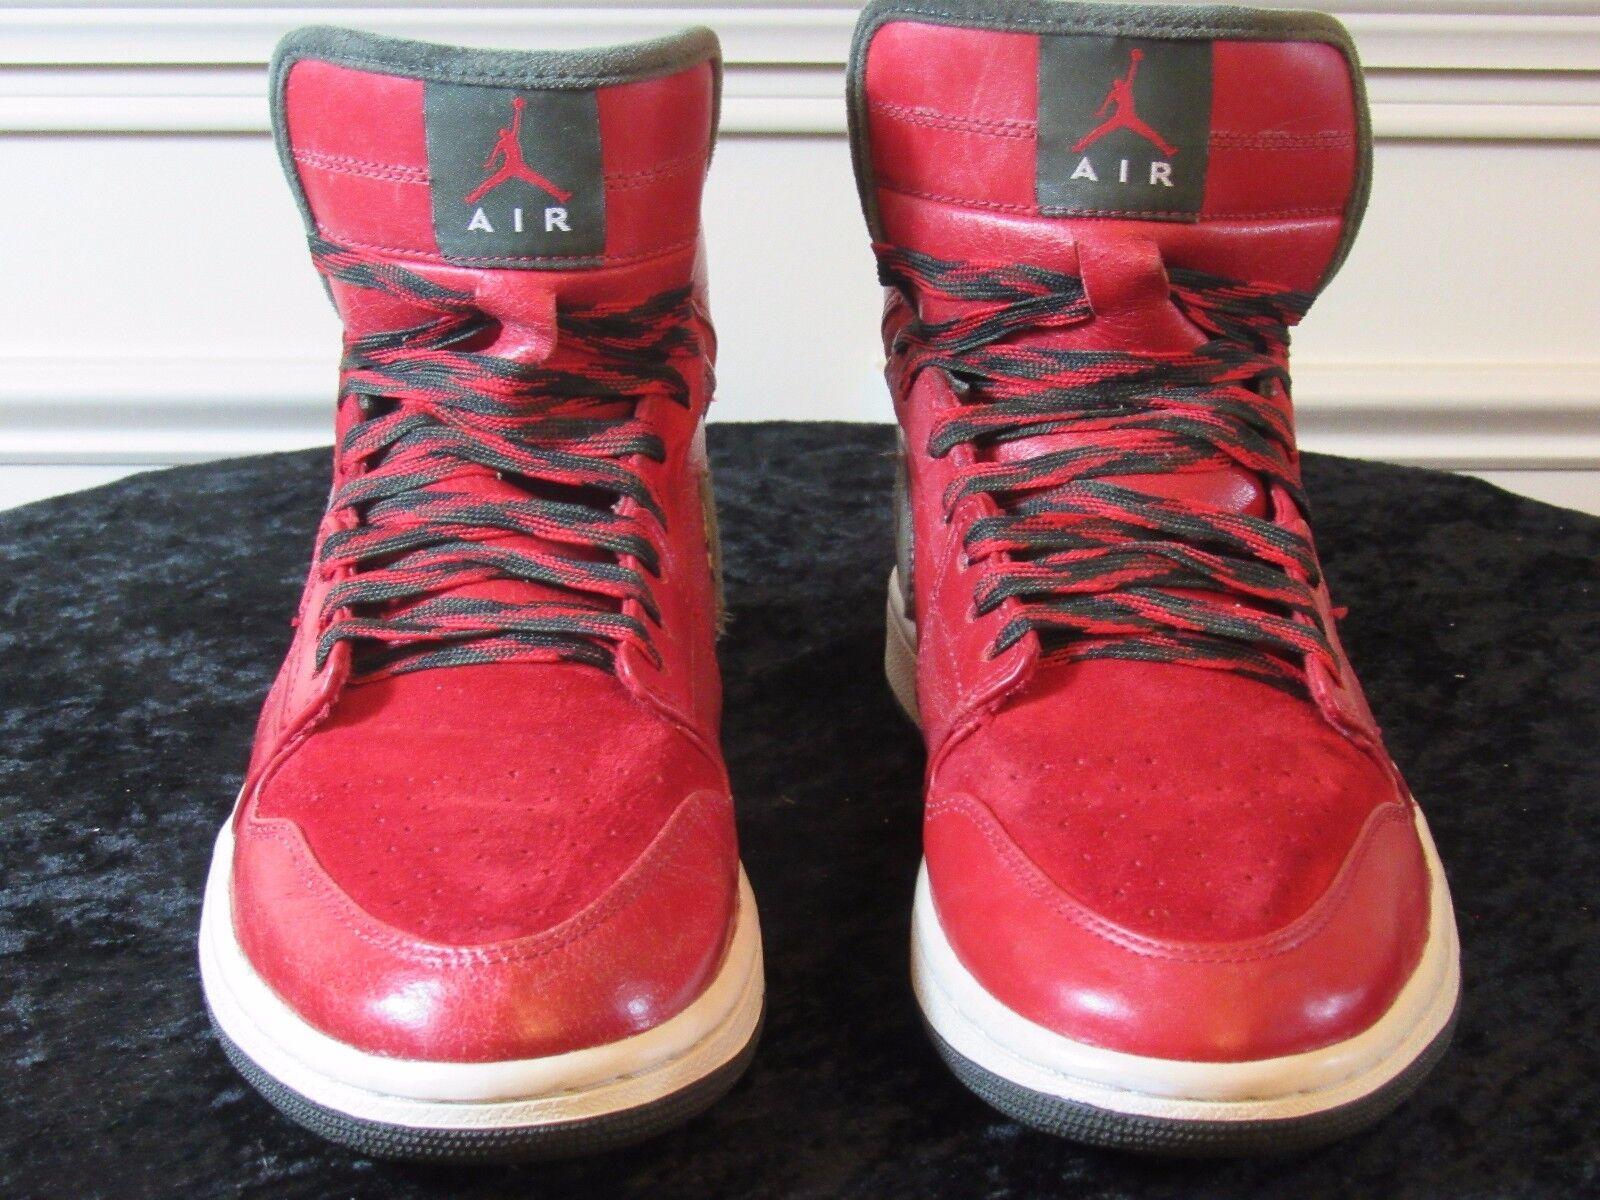 NIKE Air Jordan 1 Retro I Hi Premier 332134-631 Red Dark Army Size 10.5 US